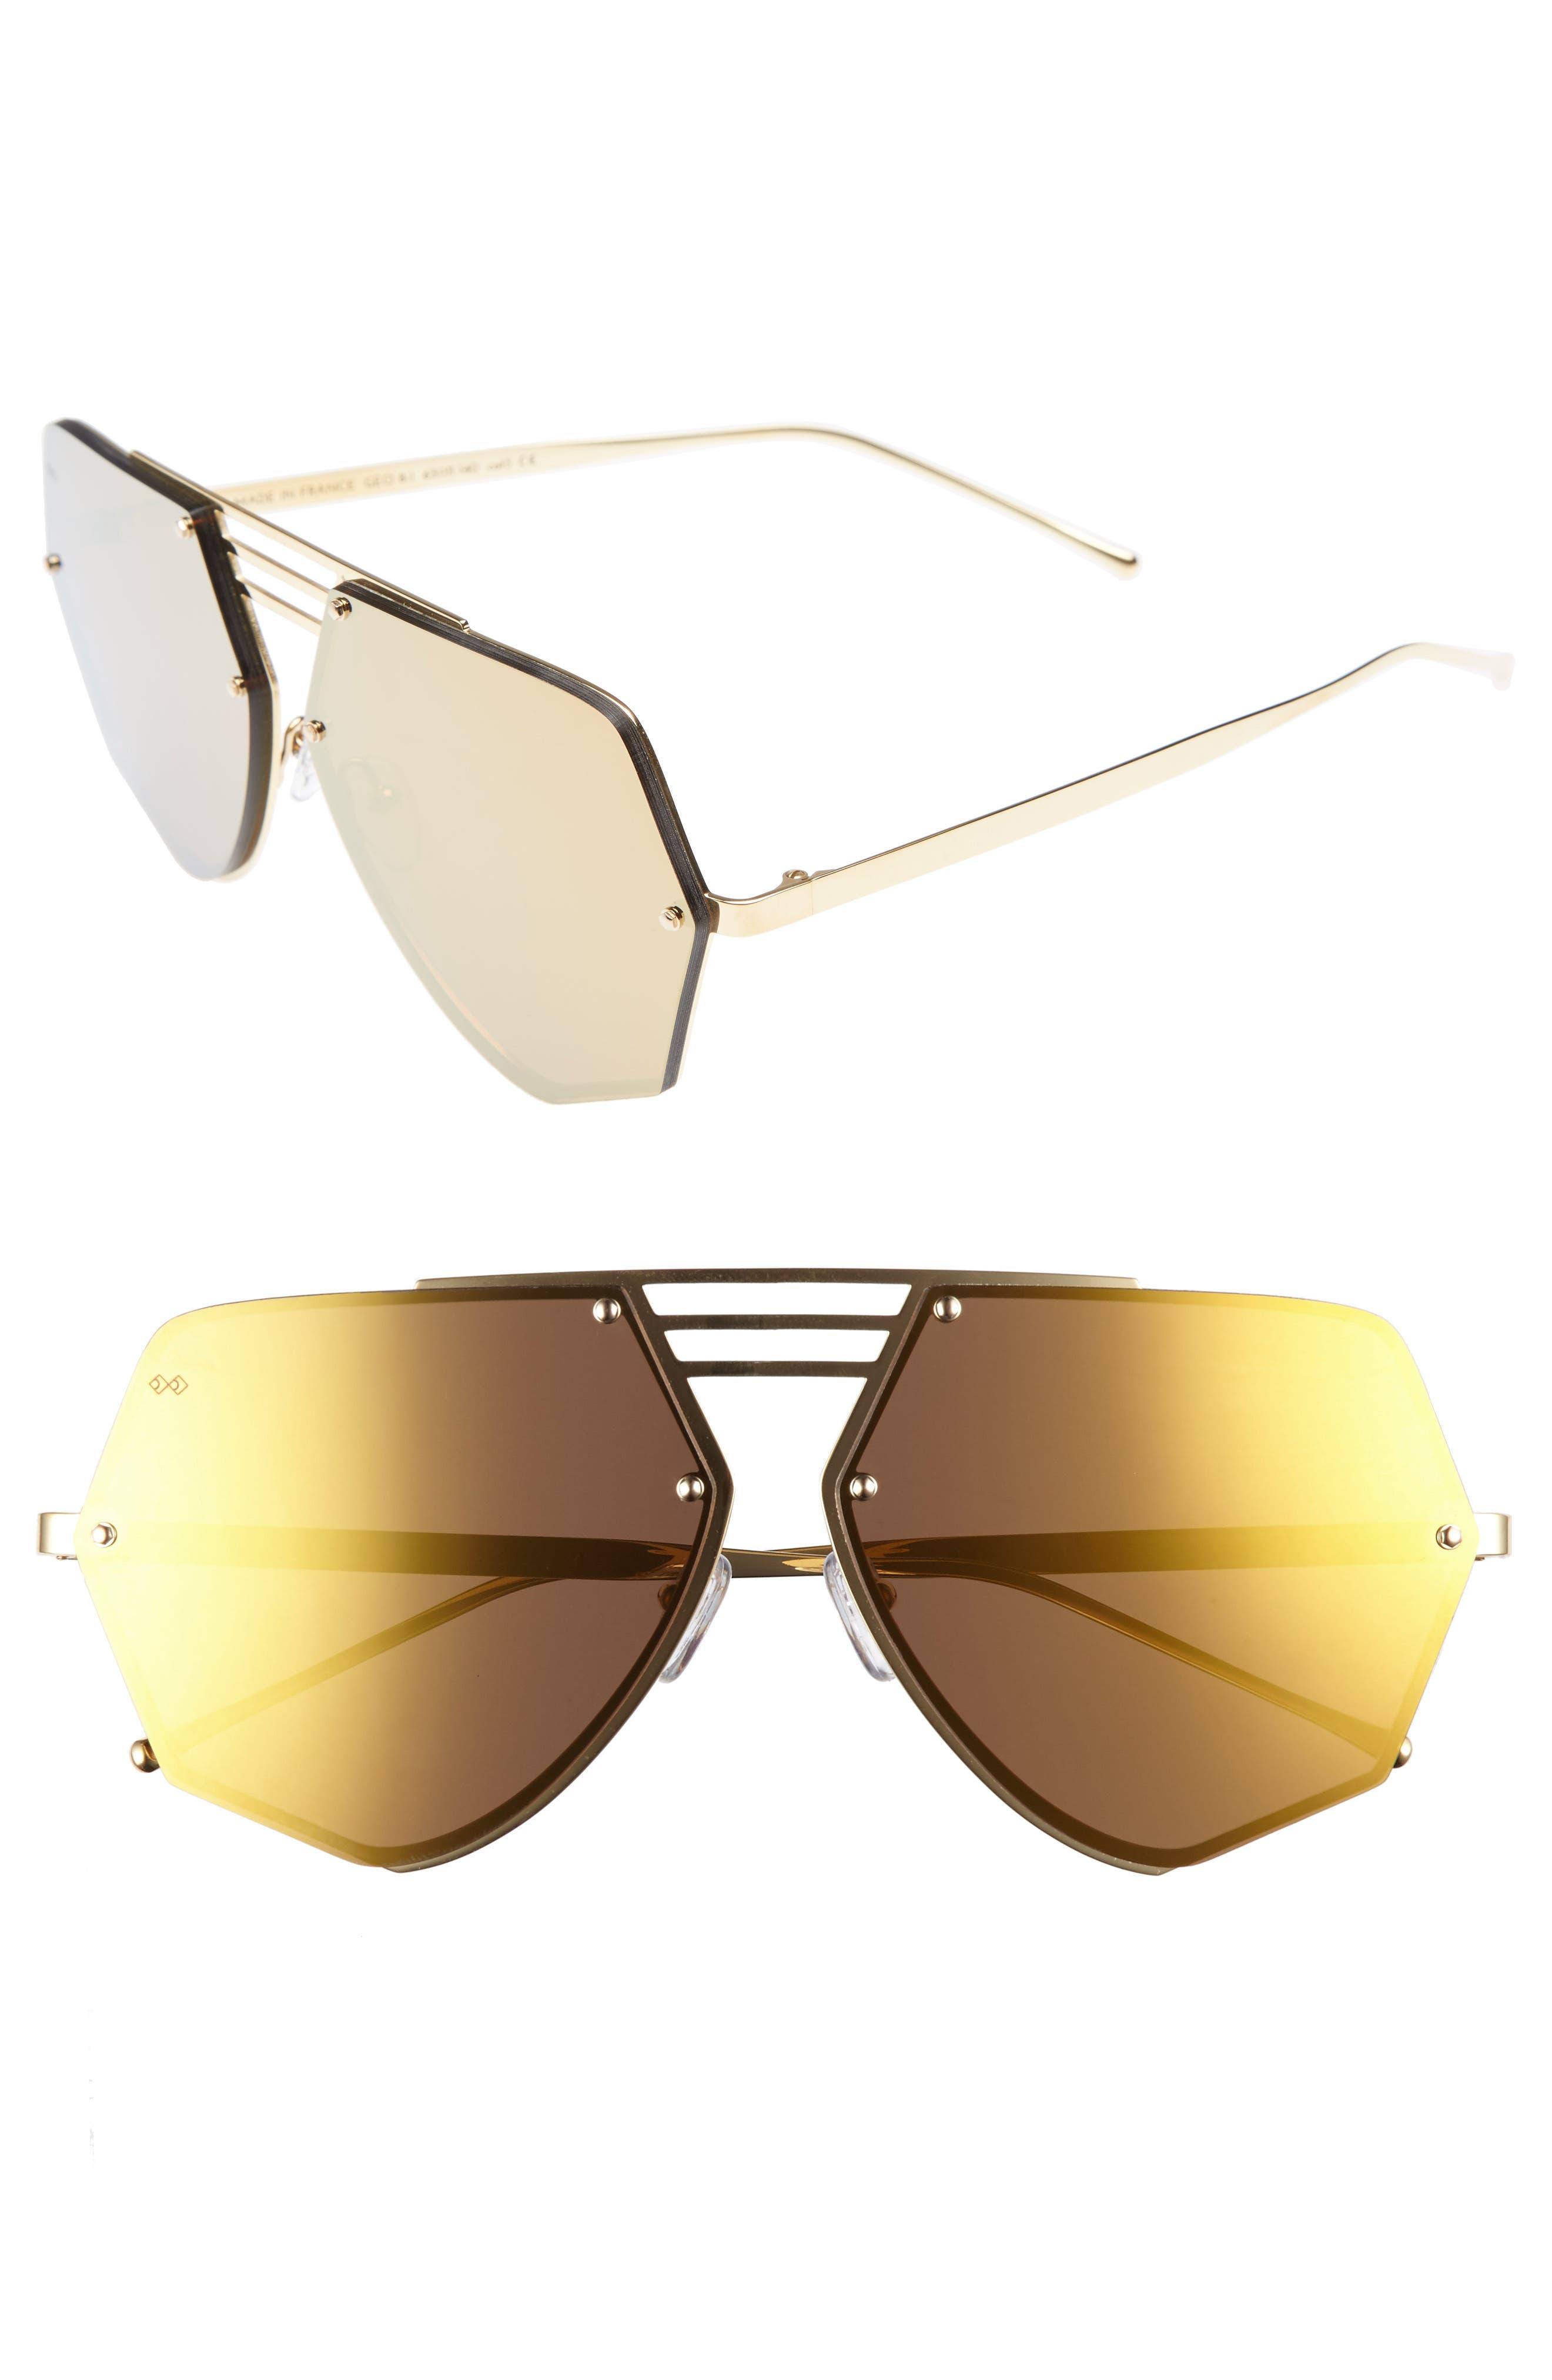 Geo 8 63mm Mirrored Sunglasses,                         Main,                         color, GOLD/ GOLD MIRROR